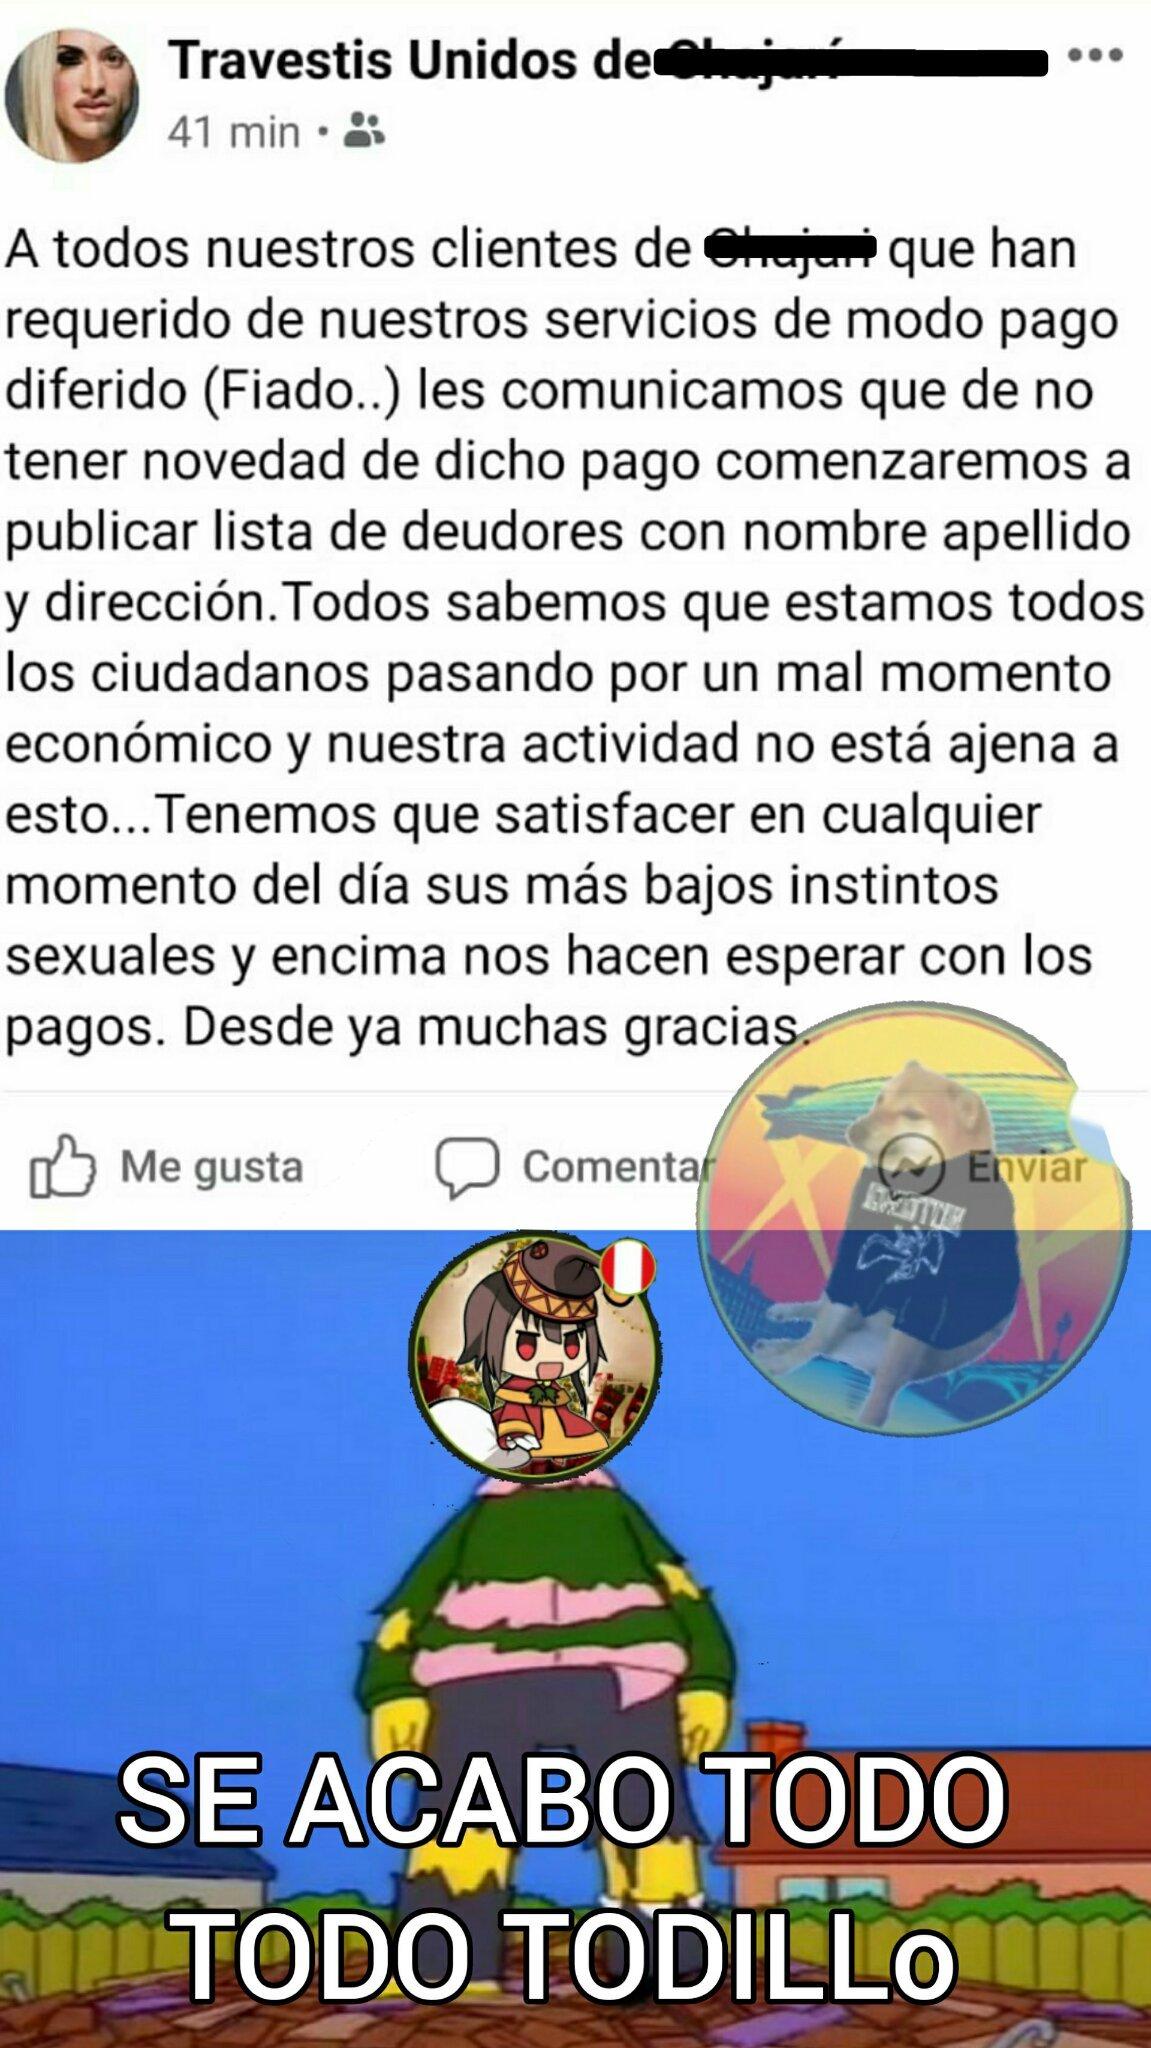 Cagaste Userdroid - meme